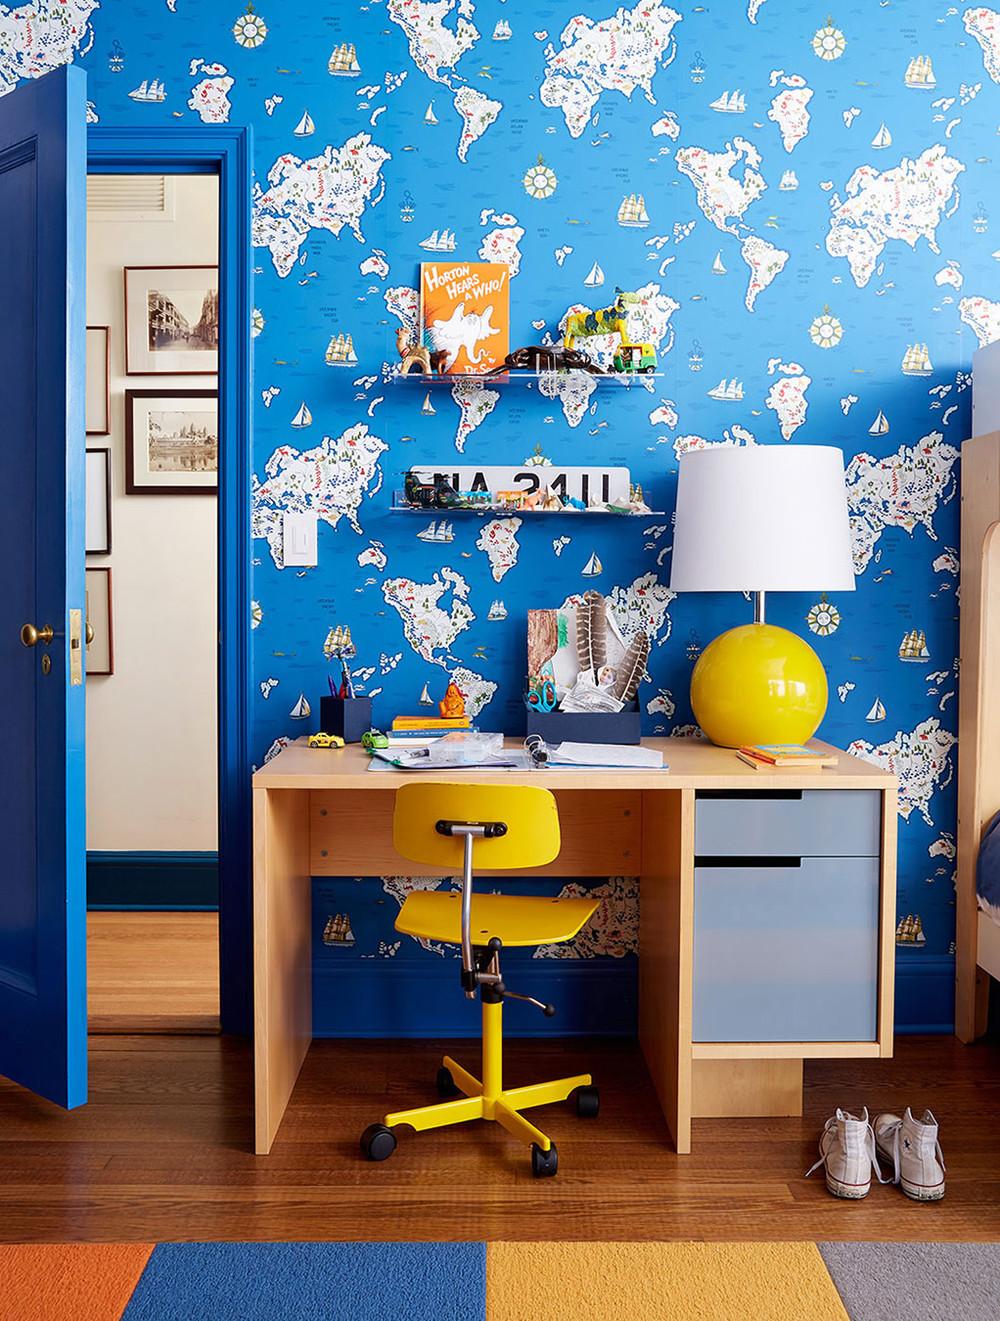 KidsRoom_Blue_Desk_264.jpg